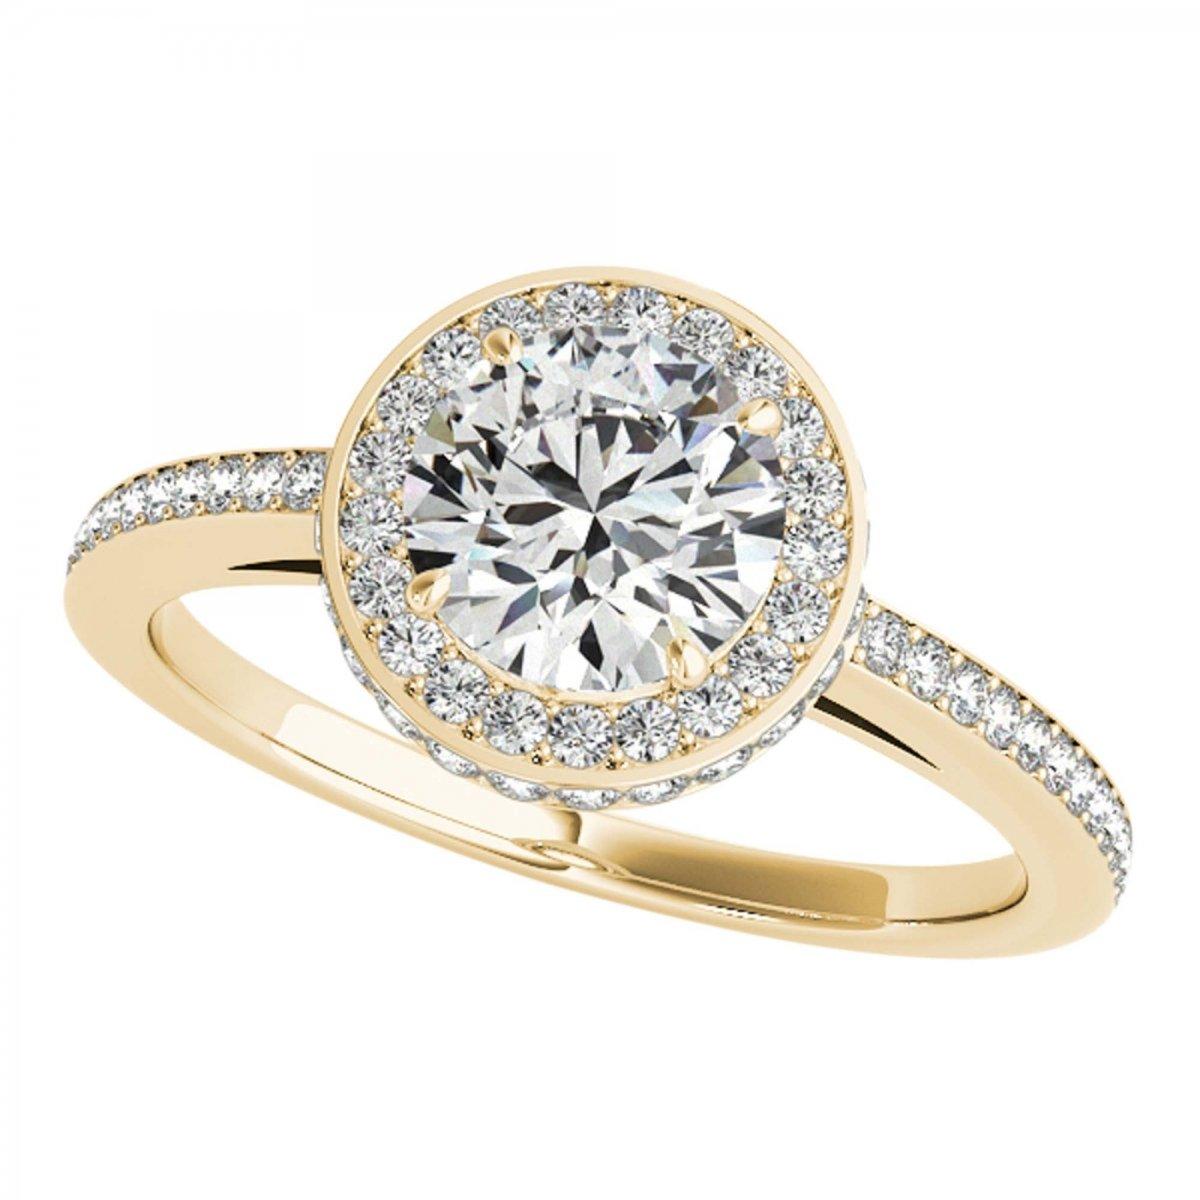 1 Carat Halo Wedding Engagement Diamond Ring In 14k Solid Yellow Gold